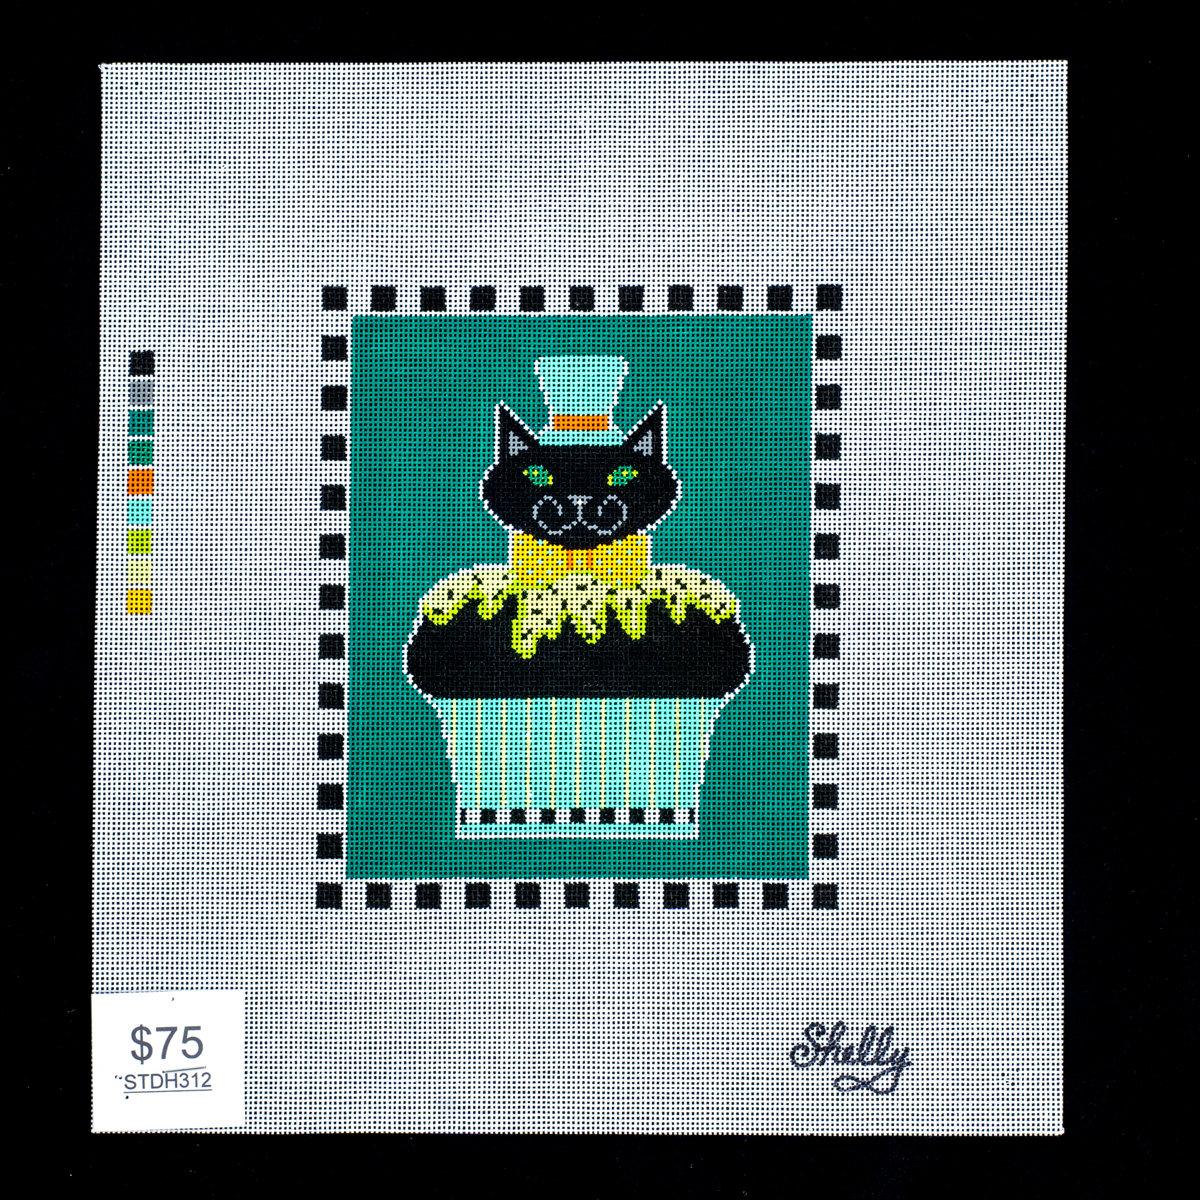 Shelly, Cupcake Cat, STDH312